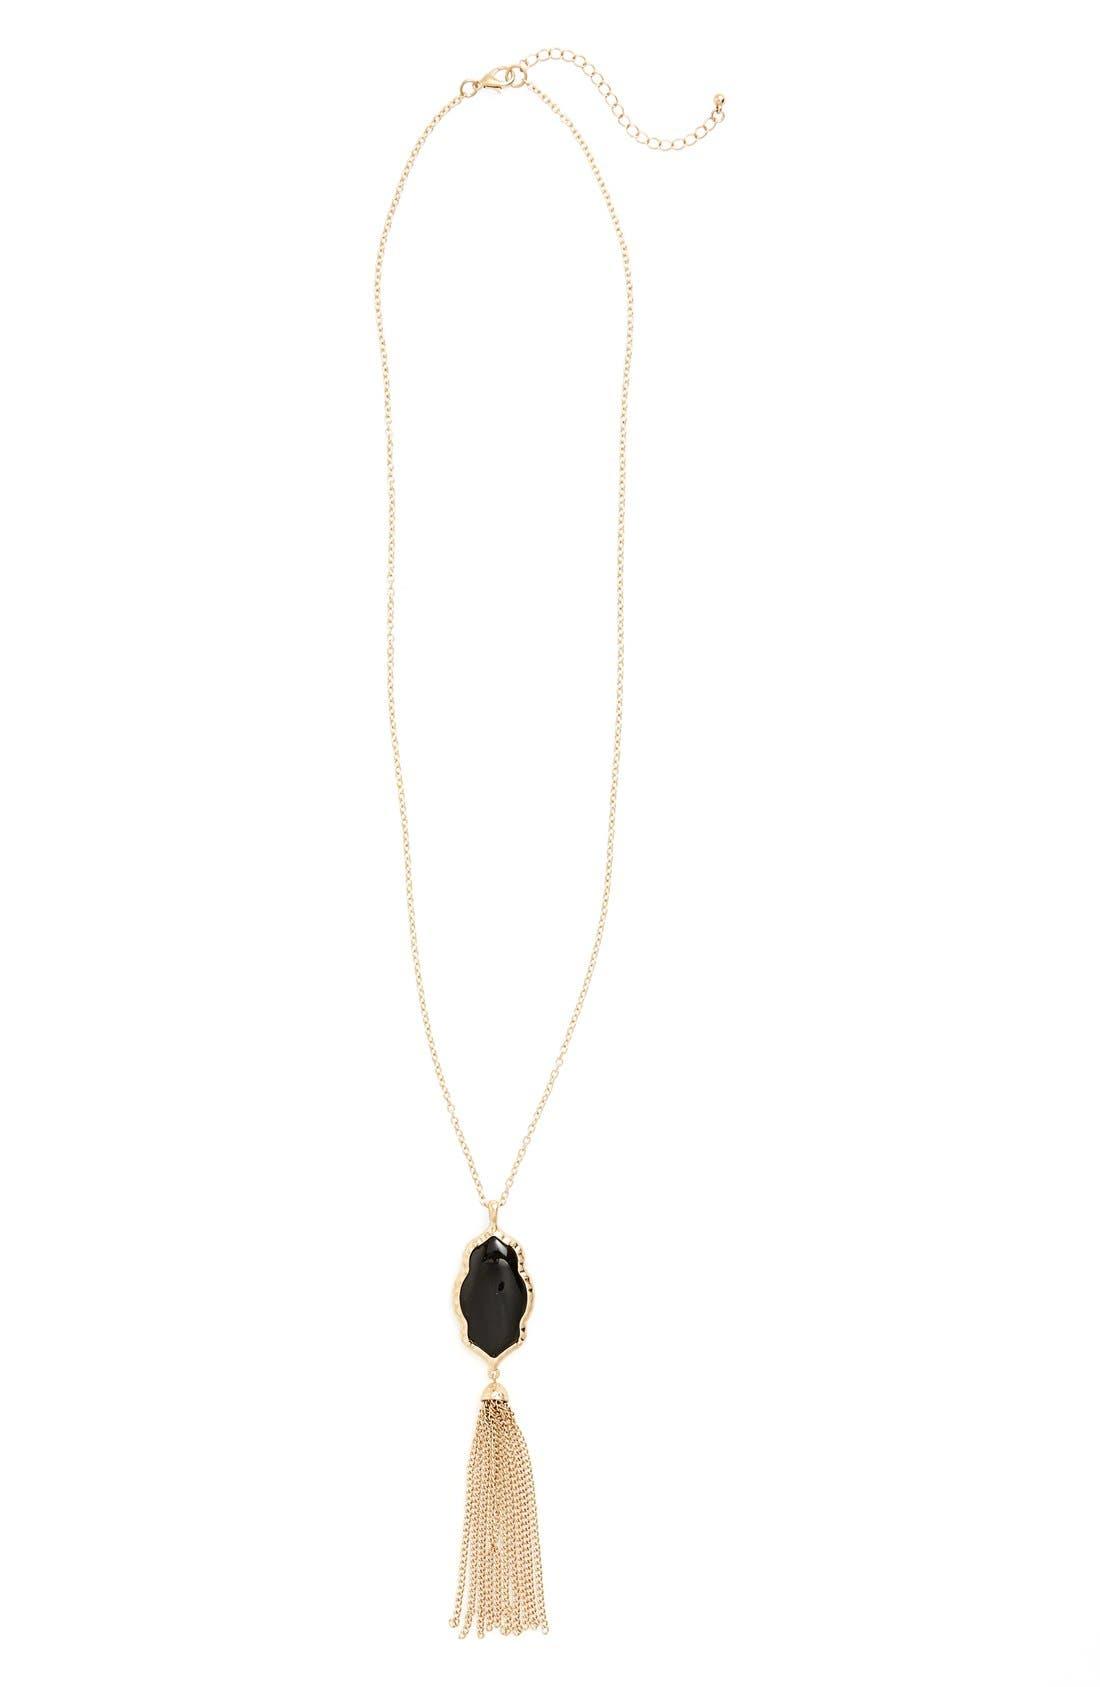 Stone Fringe Pendant Necklace,                         Main,                         color, Black/ Gold